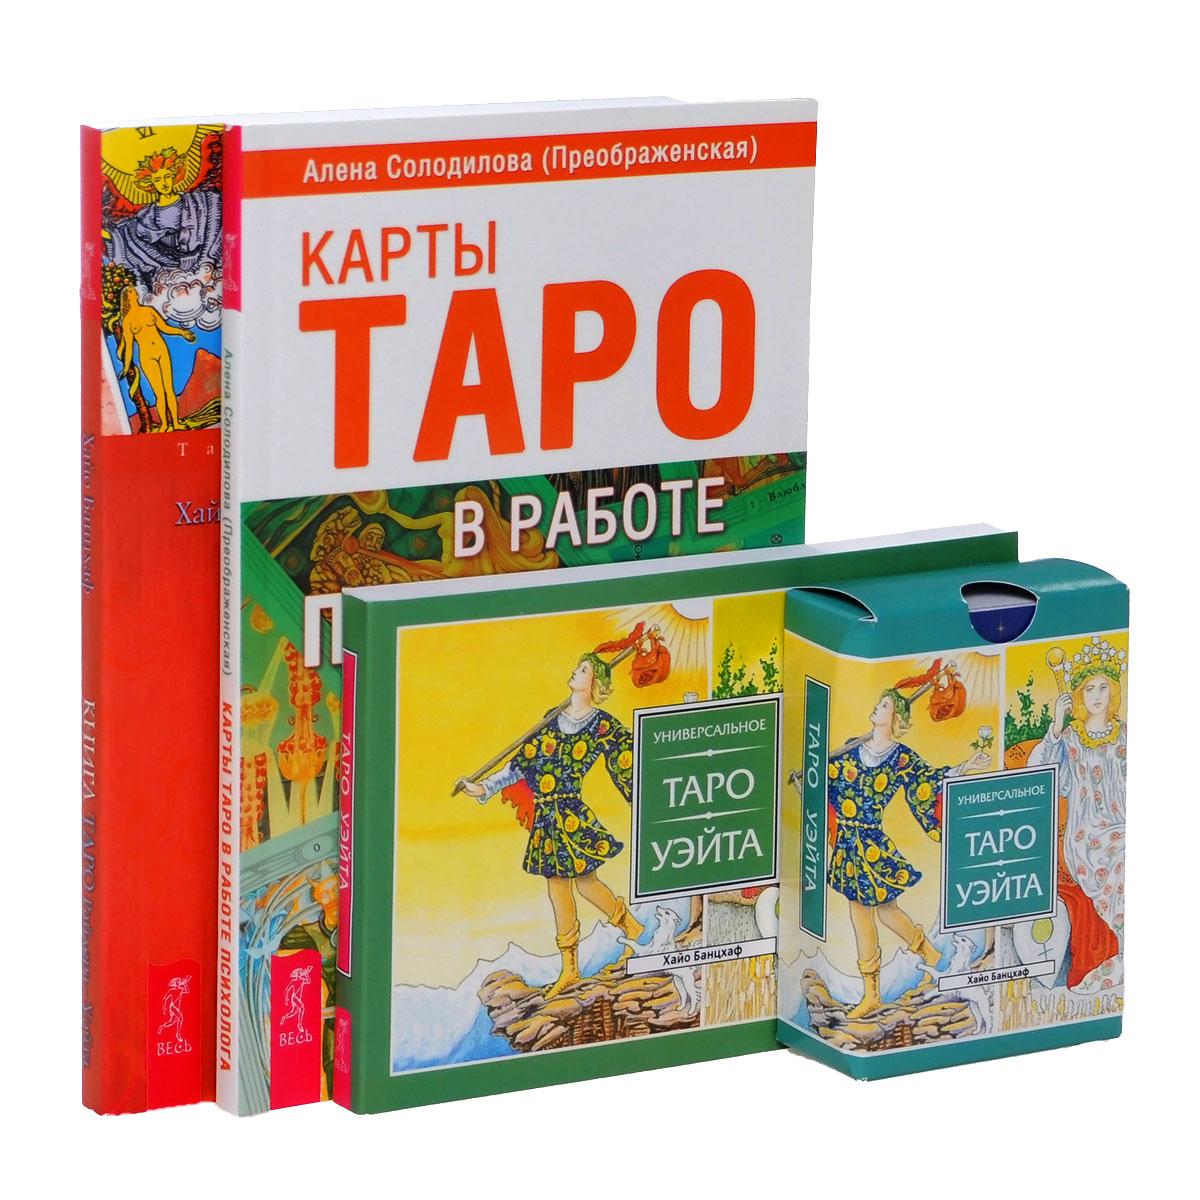 Универсальное Таро Уэйта. Карты Таро в работе психолога. Книга Таро Райдера-Уэйта (комплект из 3 книг + таро Уэйта)